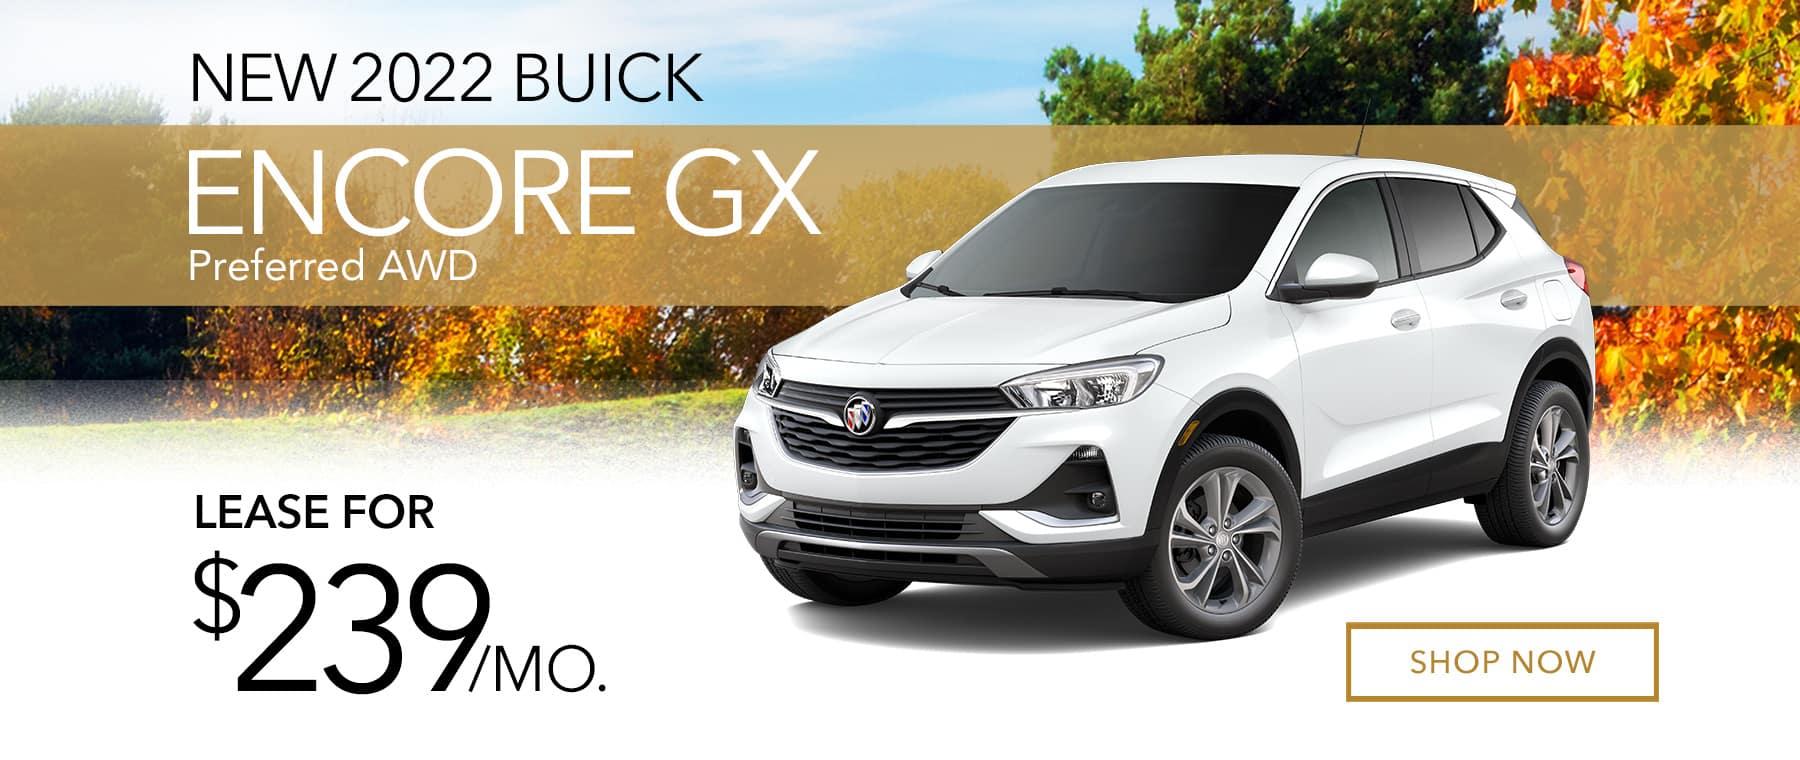 BCO-1800×760-New 2022 Buick Encore GX Preferred AWD _0921